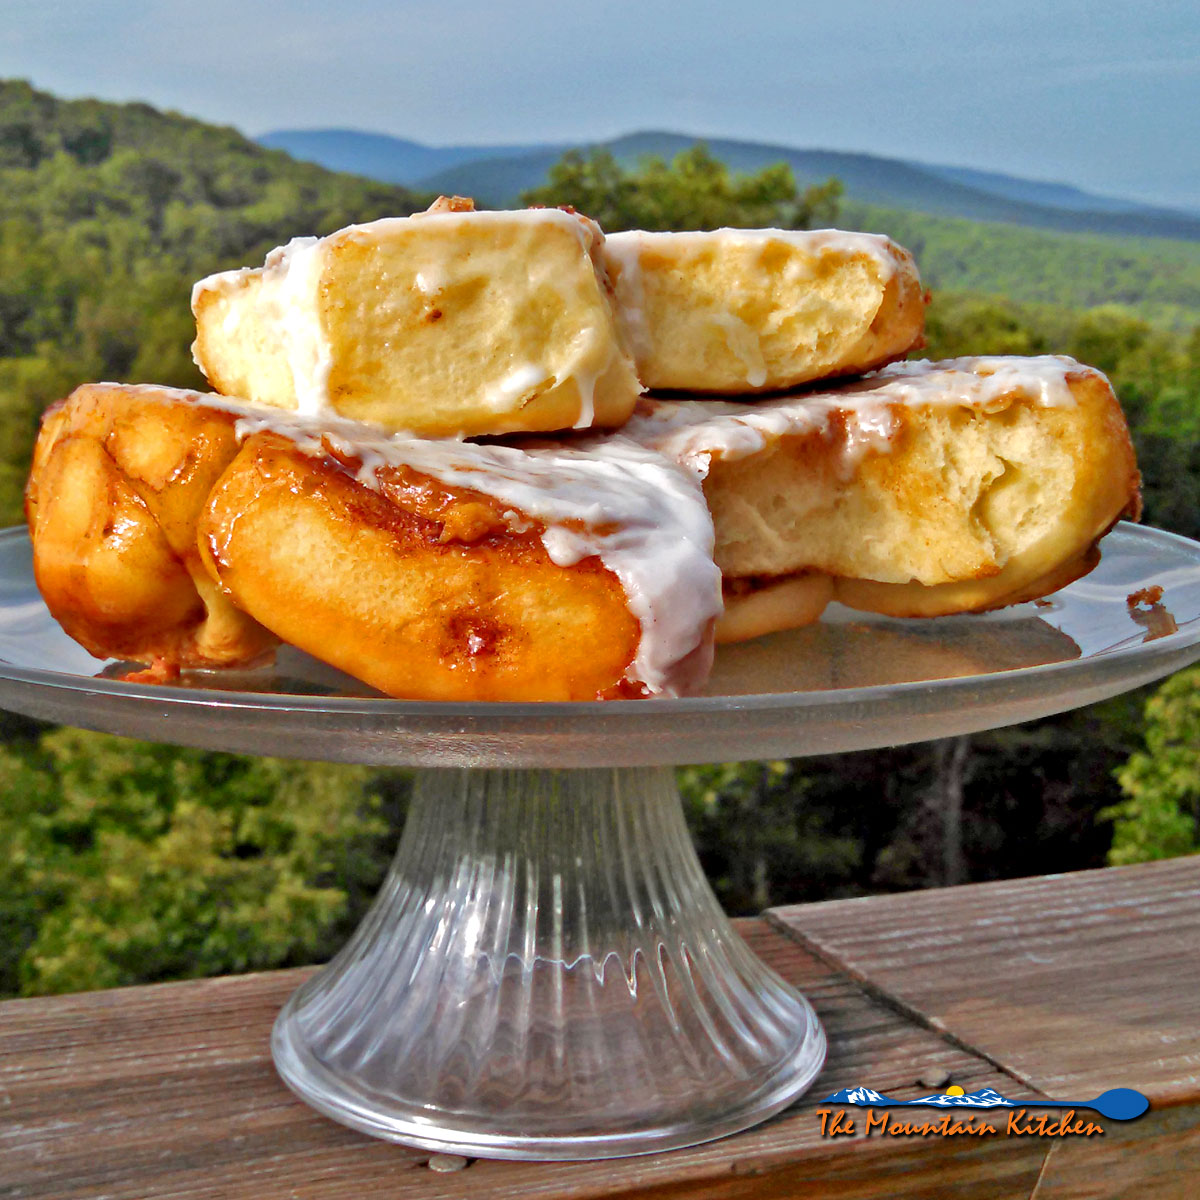 Homemade Cinnamon Rolls With Creamy Sugar Glaze